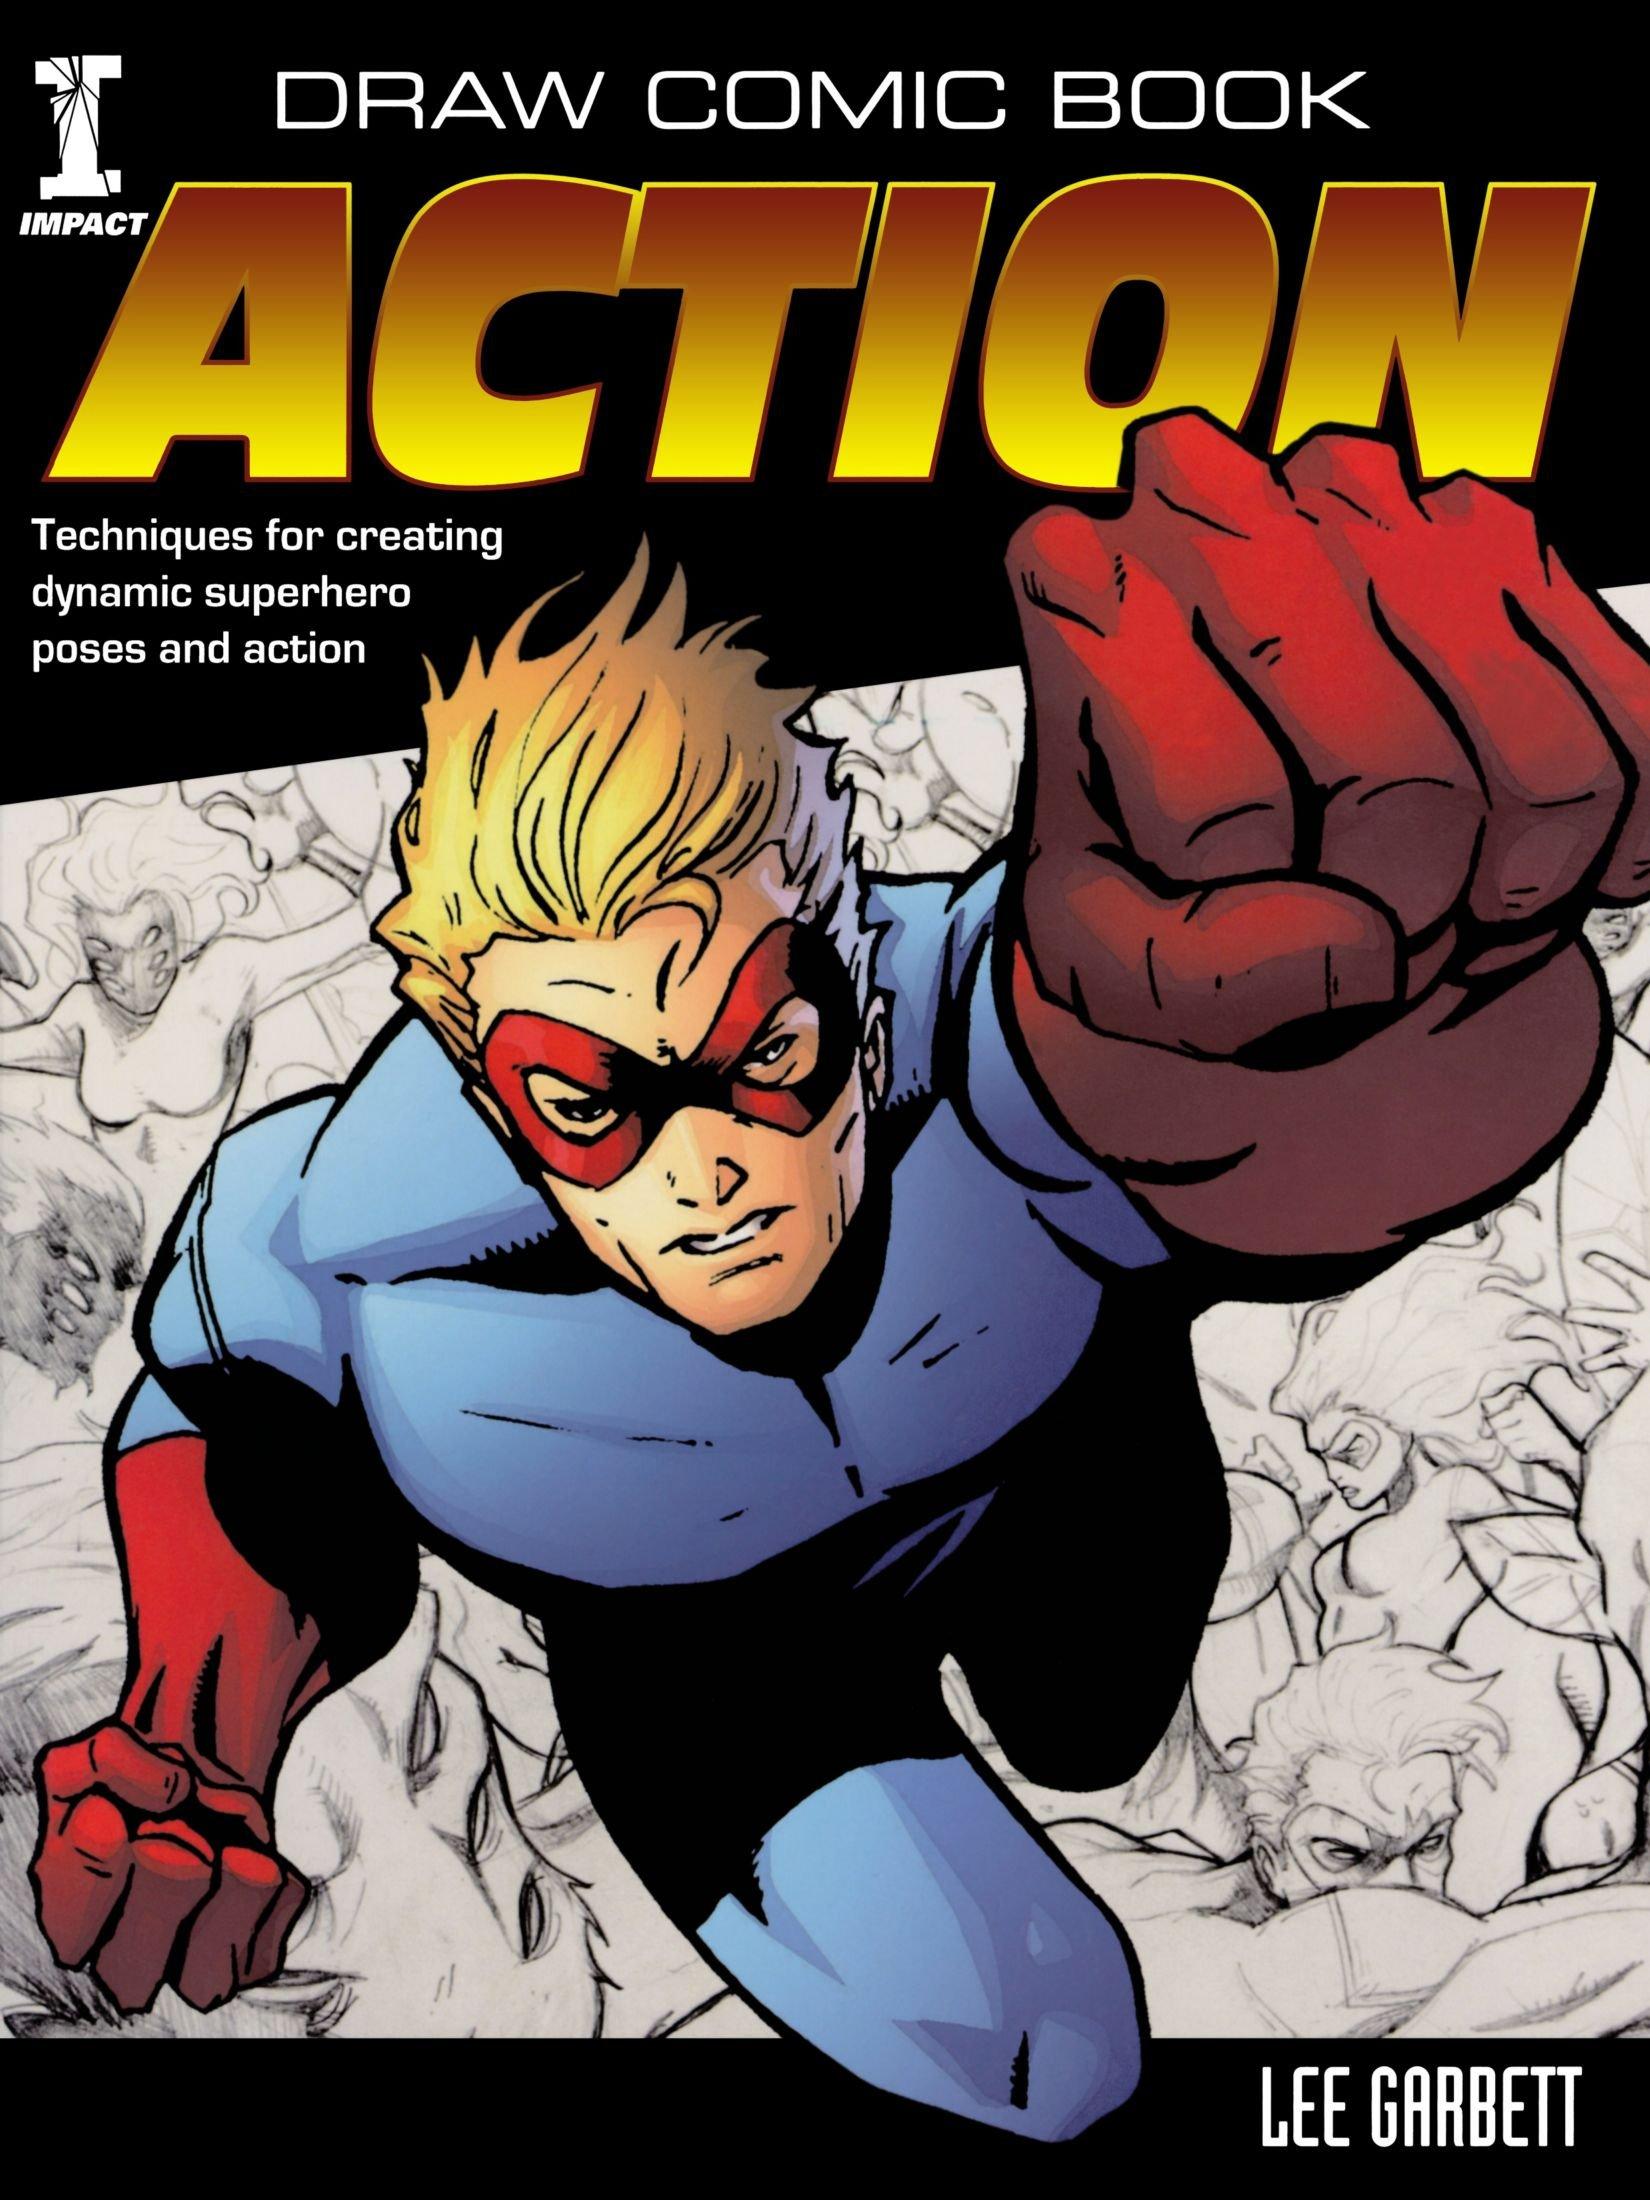 Draw Comic Book Action: Lee Garbett: 9781440308130: Amazon.com: Books